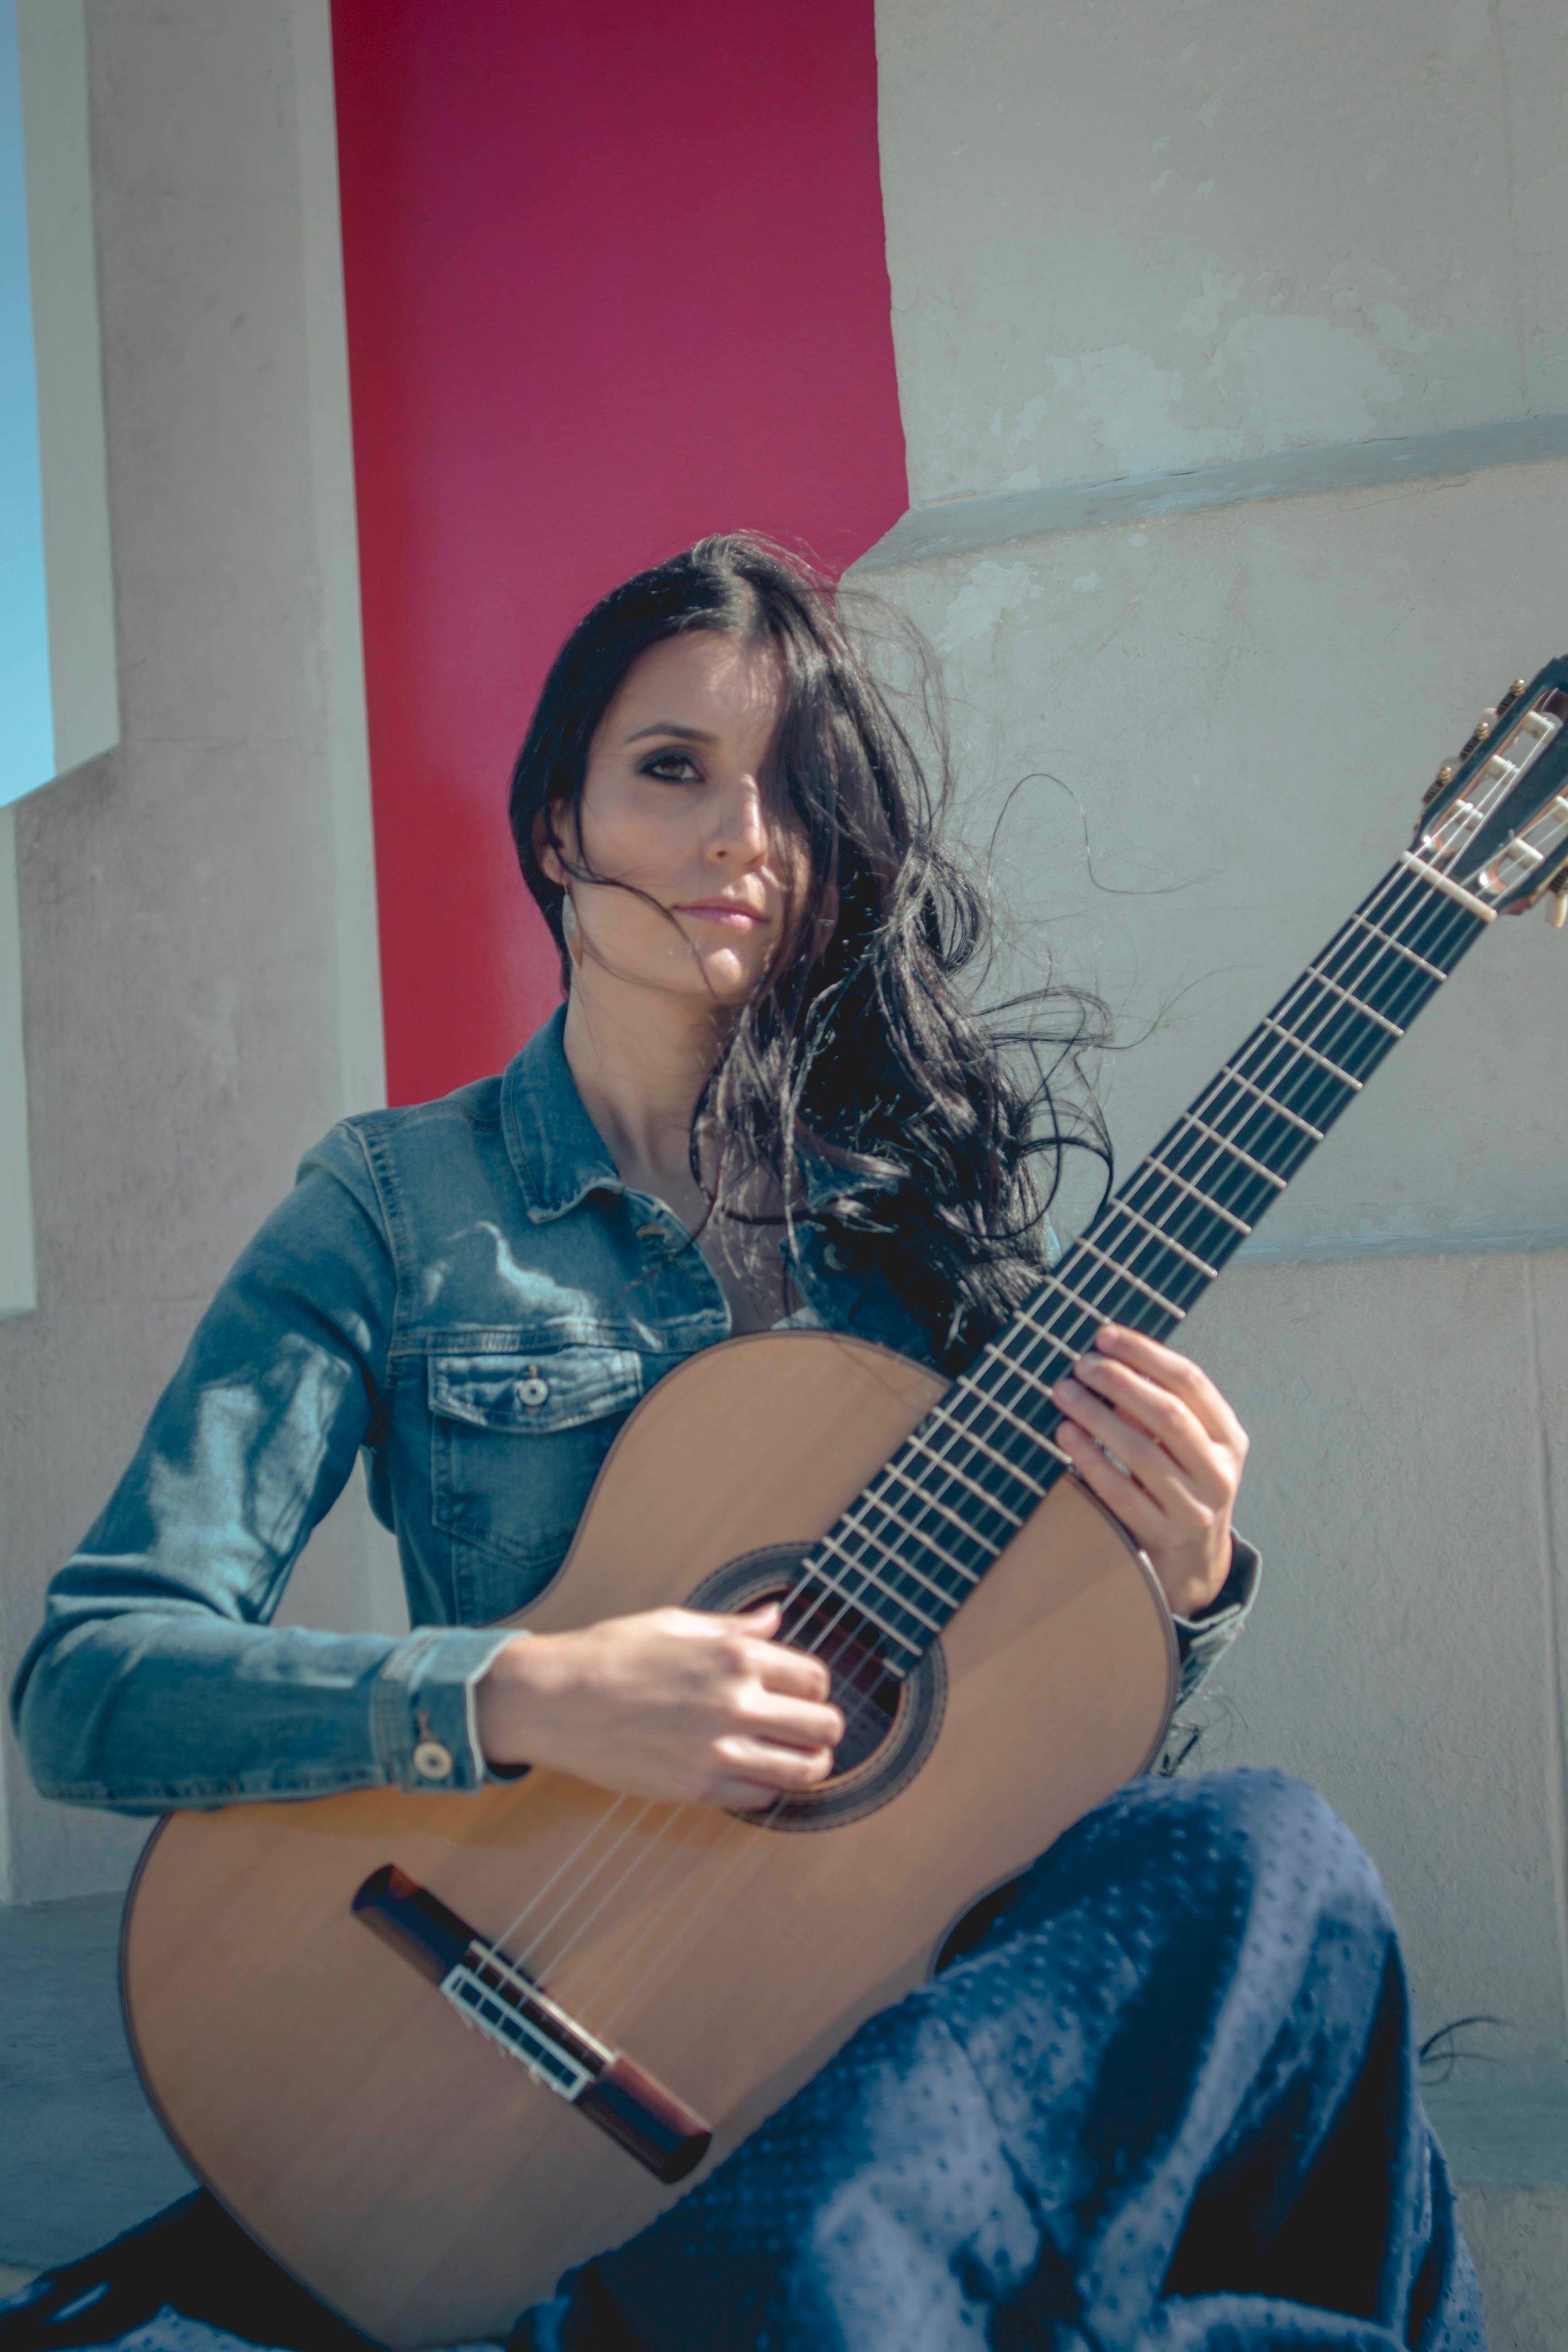 isabel martinez guitar 14.jpg